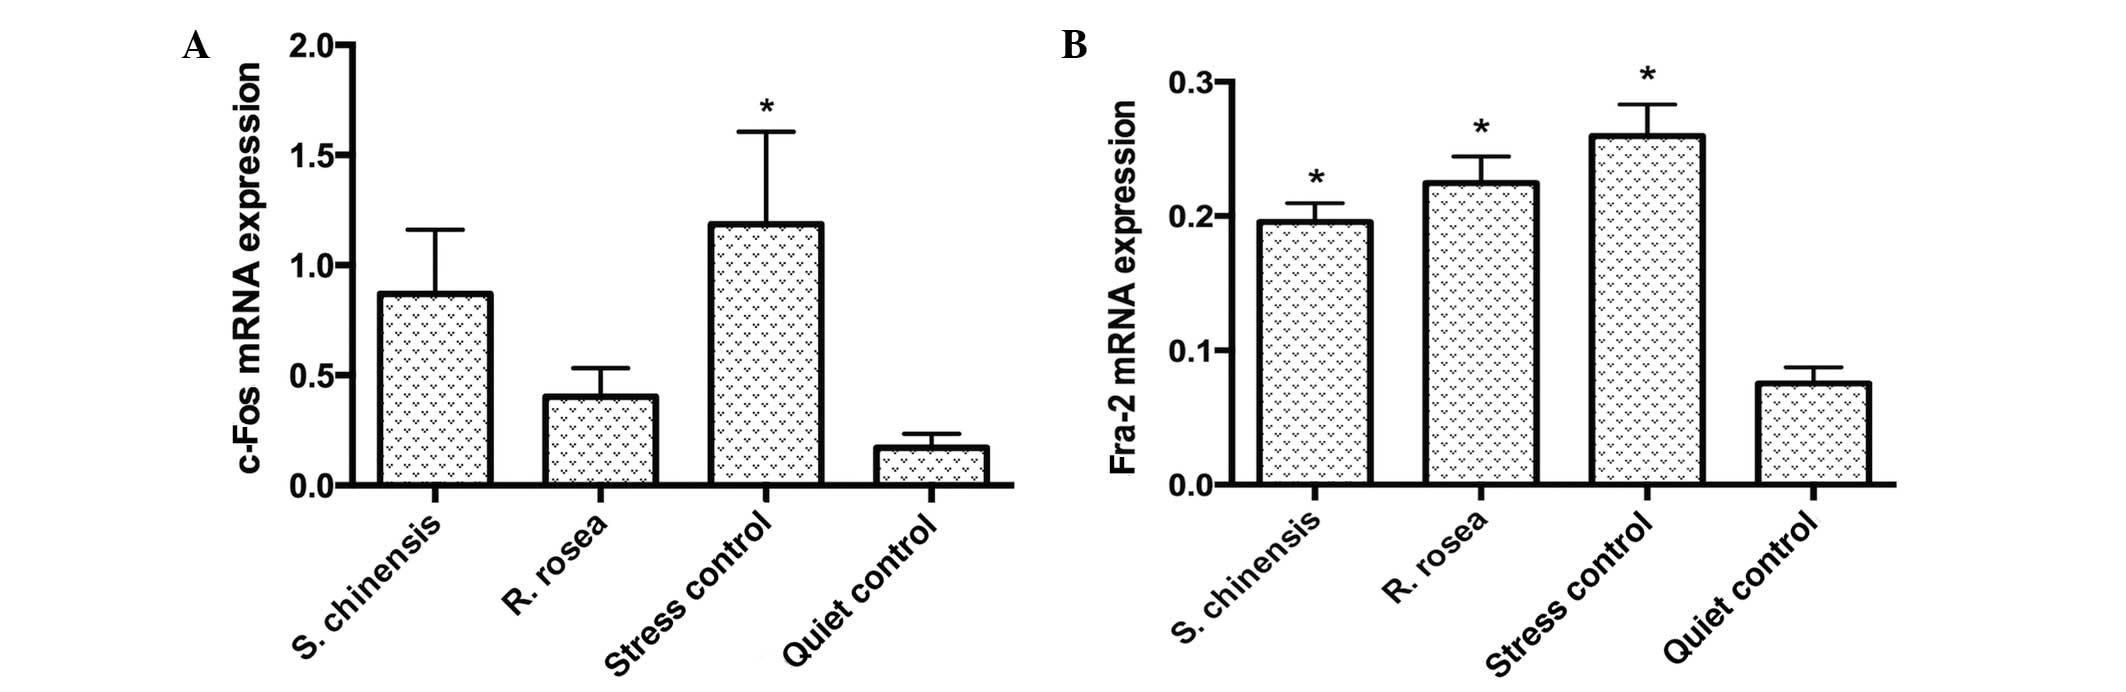 Schisandra chinensis and Rhodiola rosea exert an anti-stress